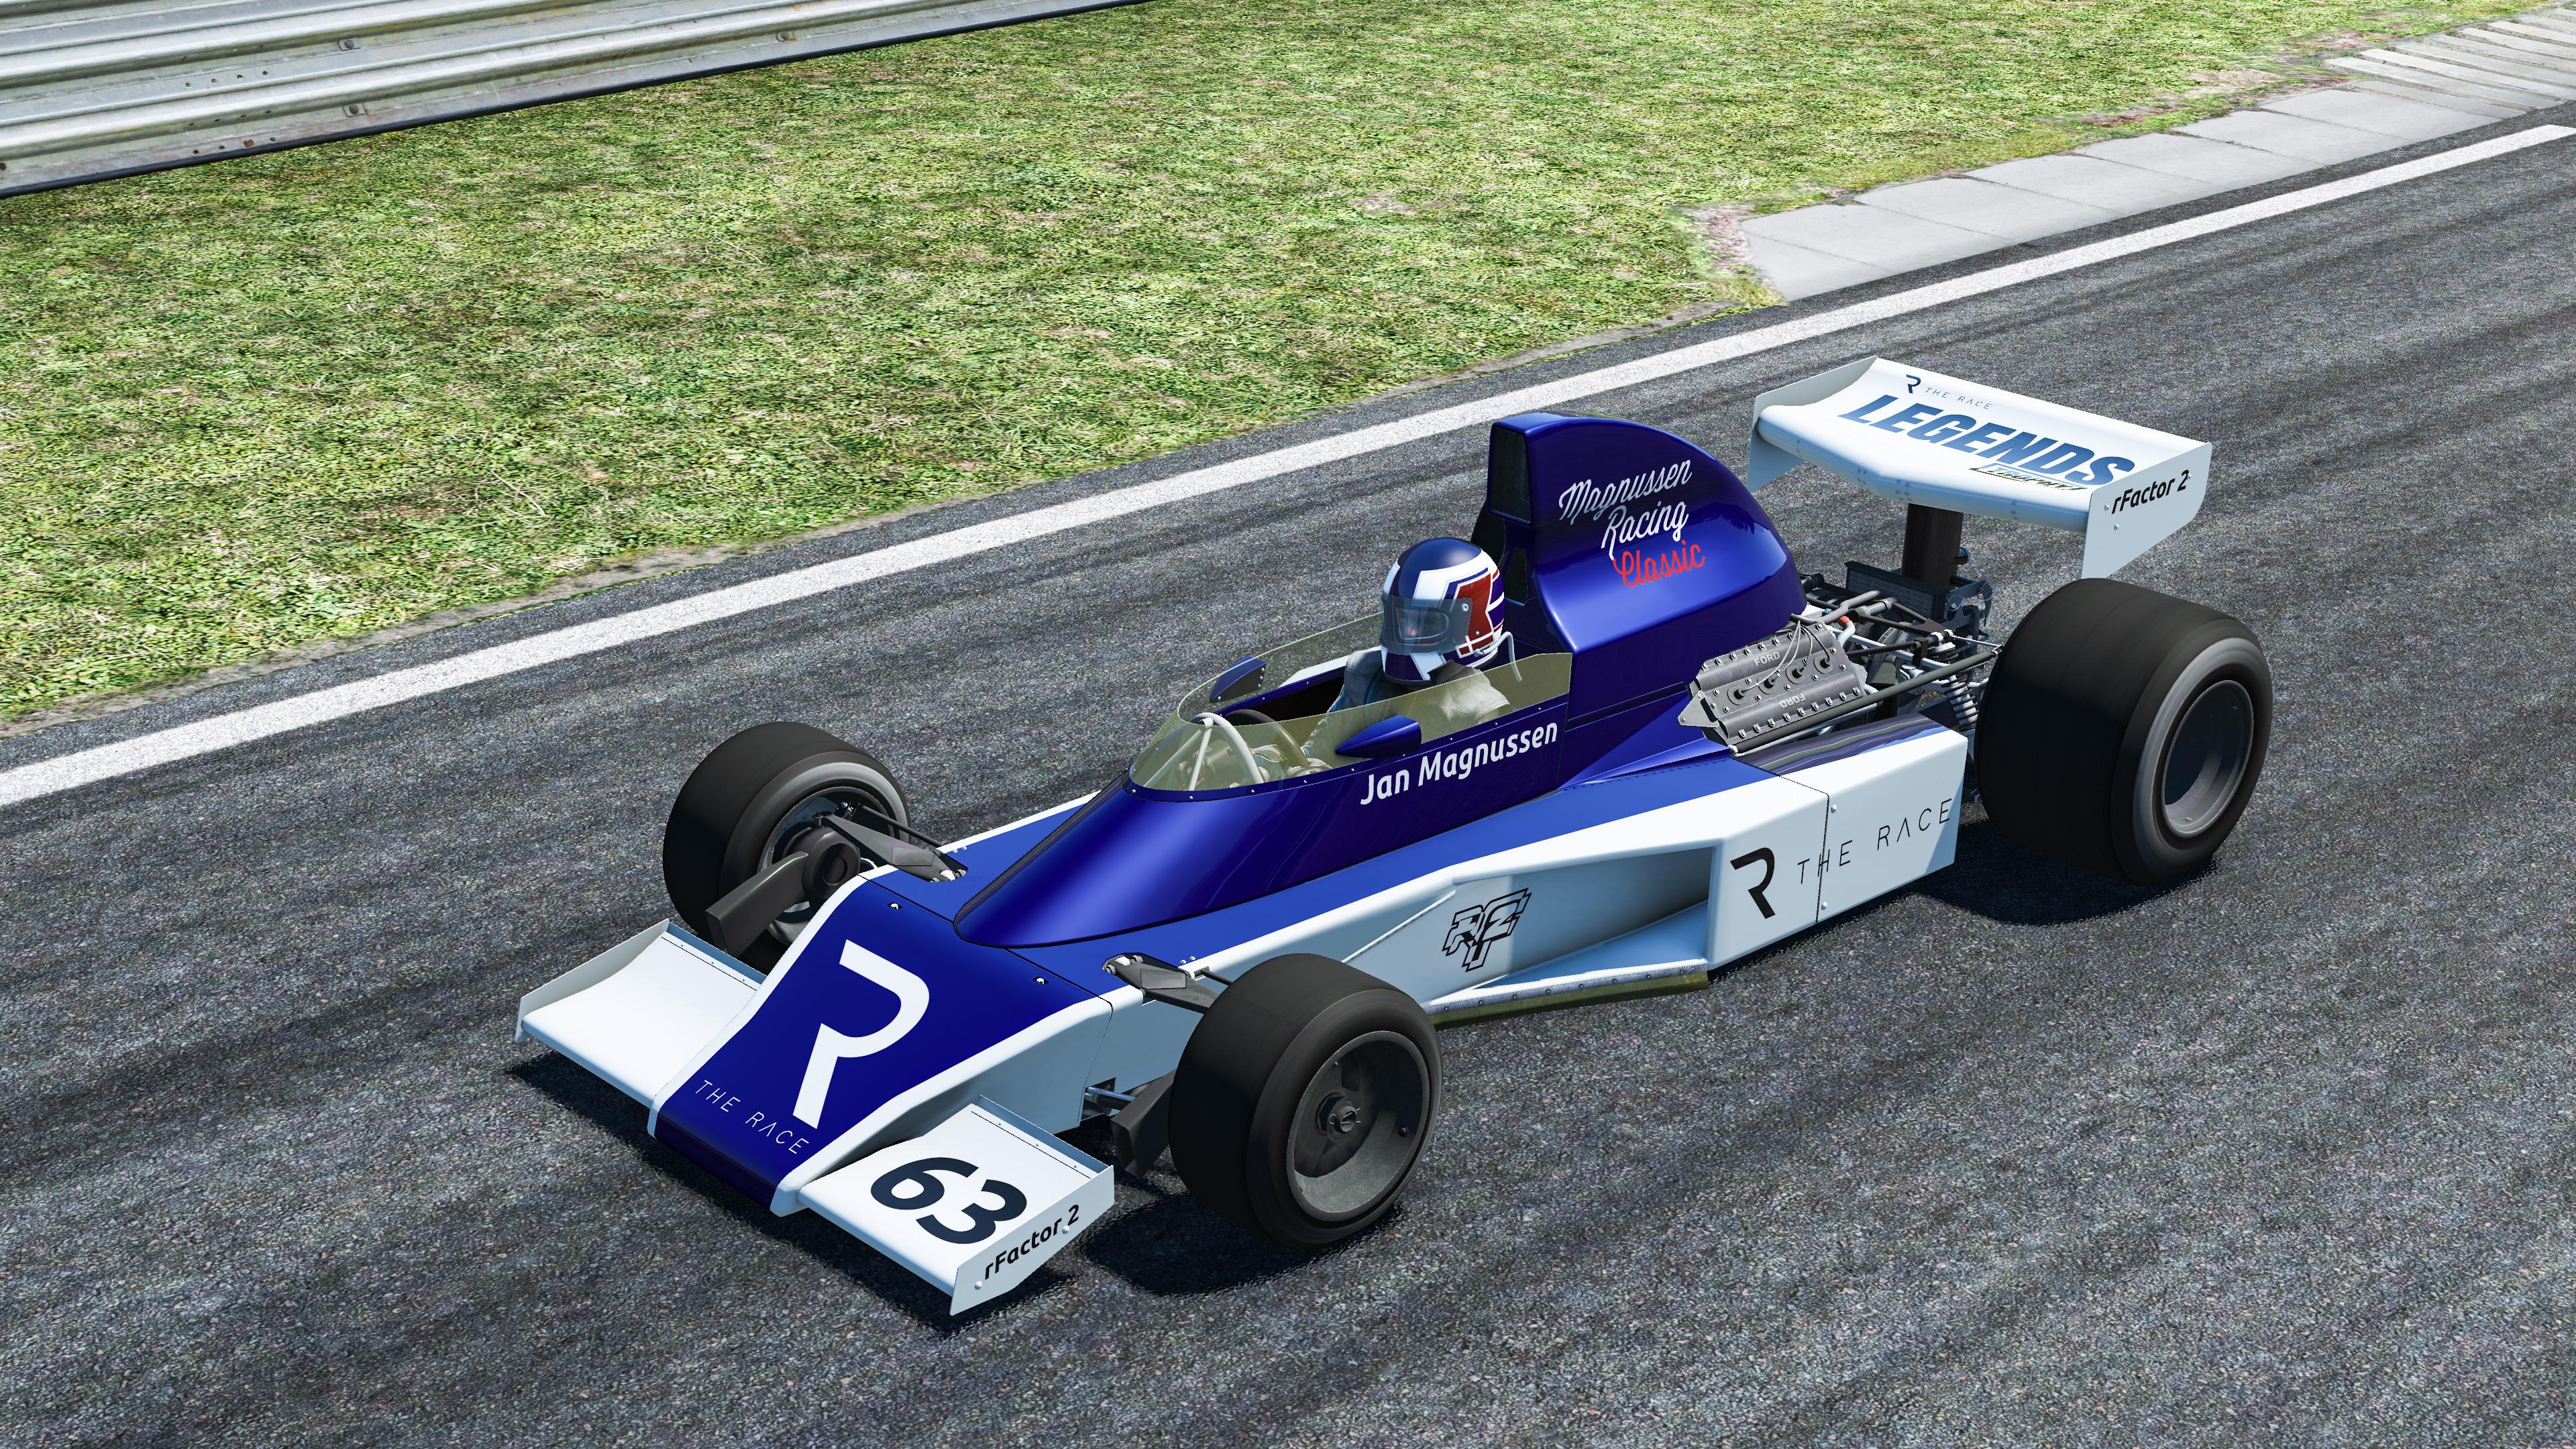 Jan Magnussen The Race Legends Trophy 2020